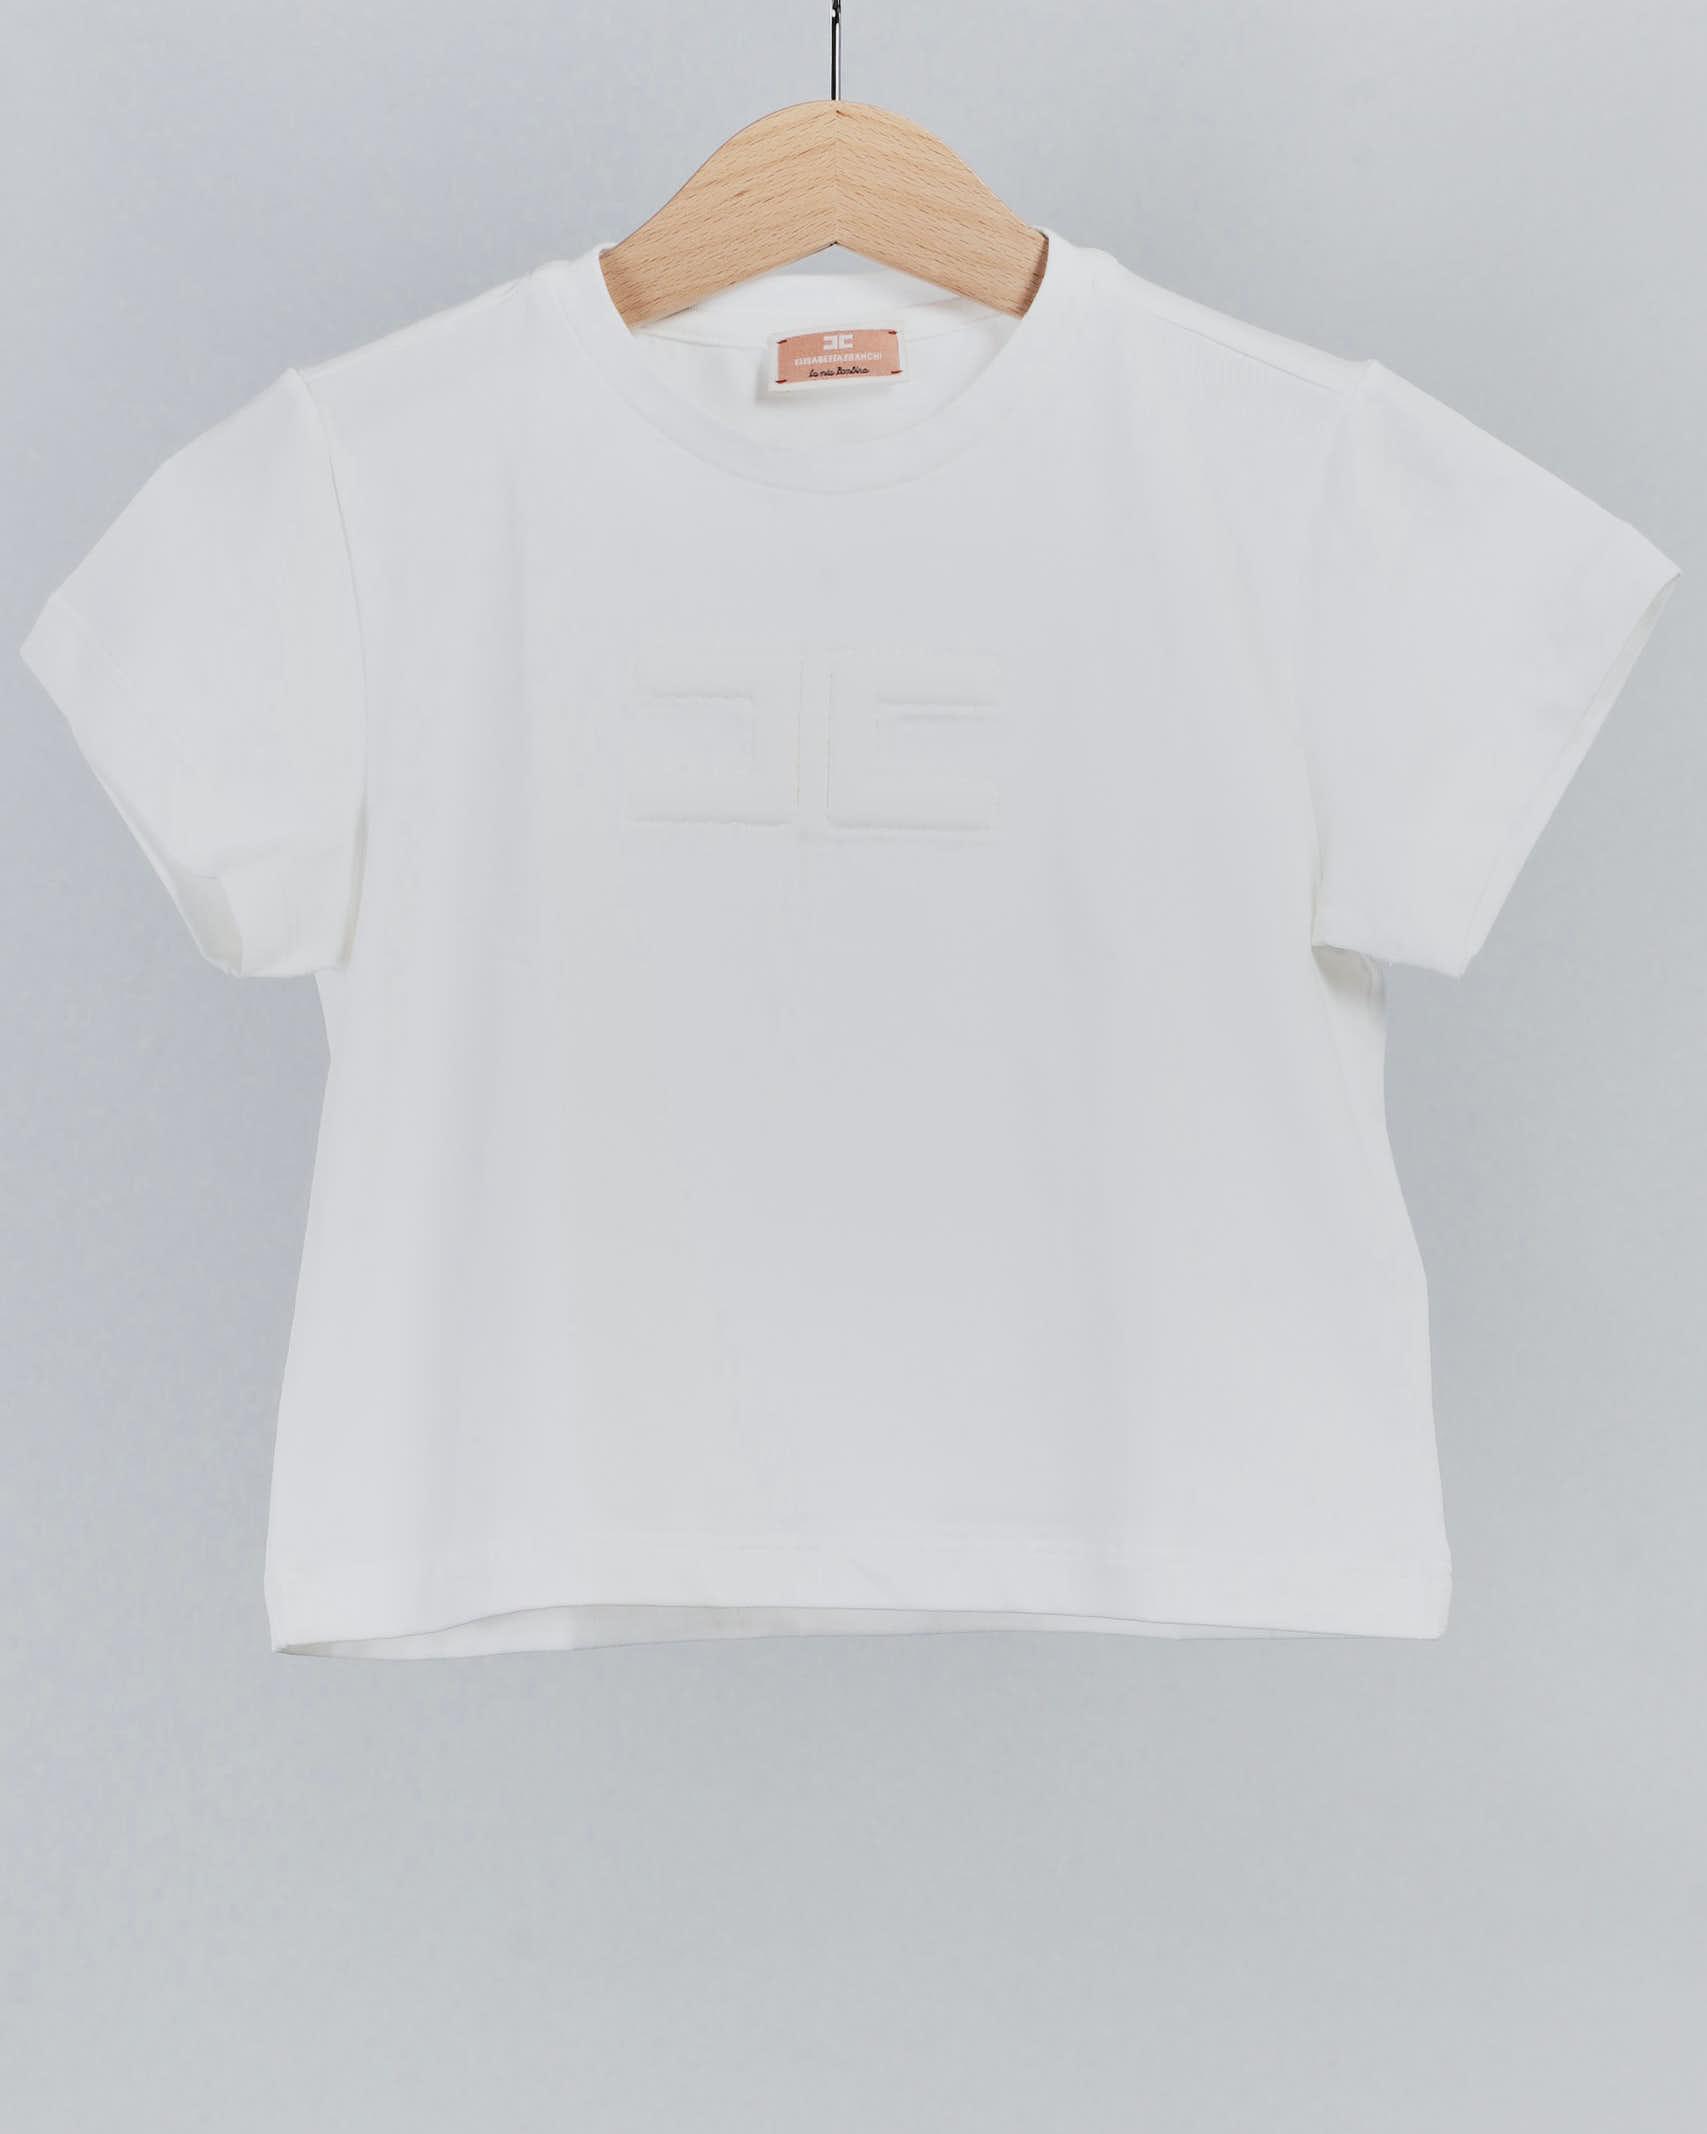 T-shirt basic con logo Elisabetta Franchi La Mia Bambina ELISABETTA FRANCHI LA MIA BAMBINA | T-shirt | EFTS130JE95WE02522